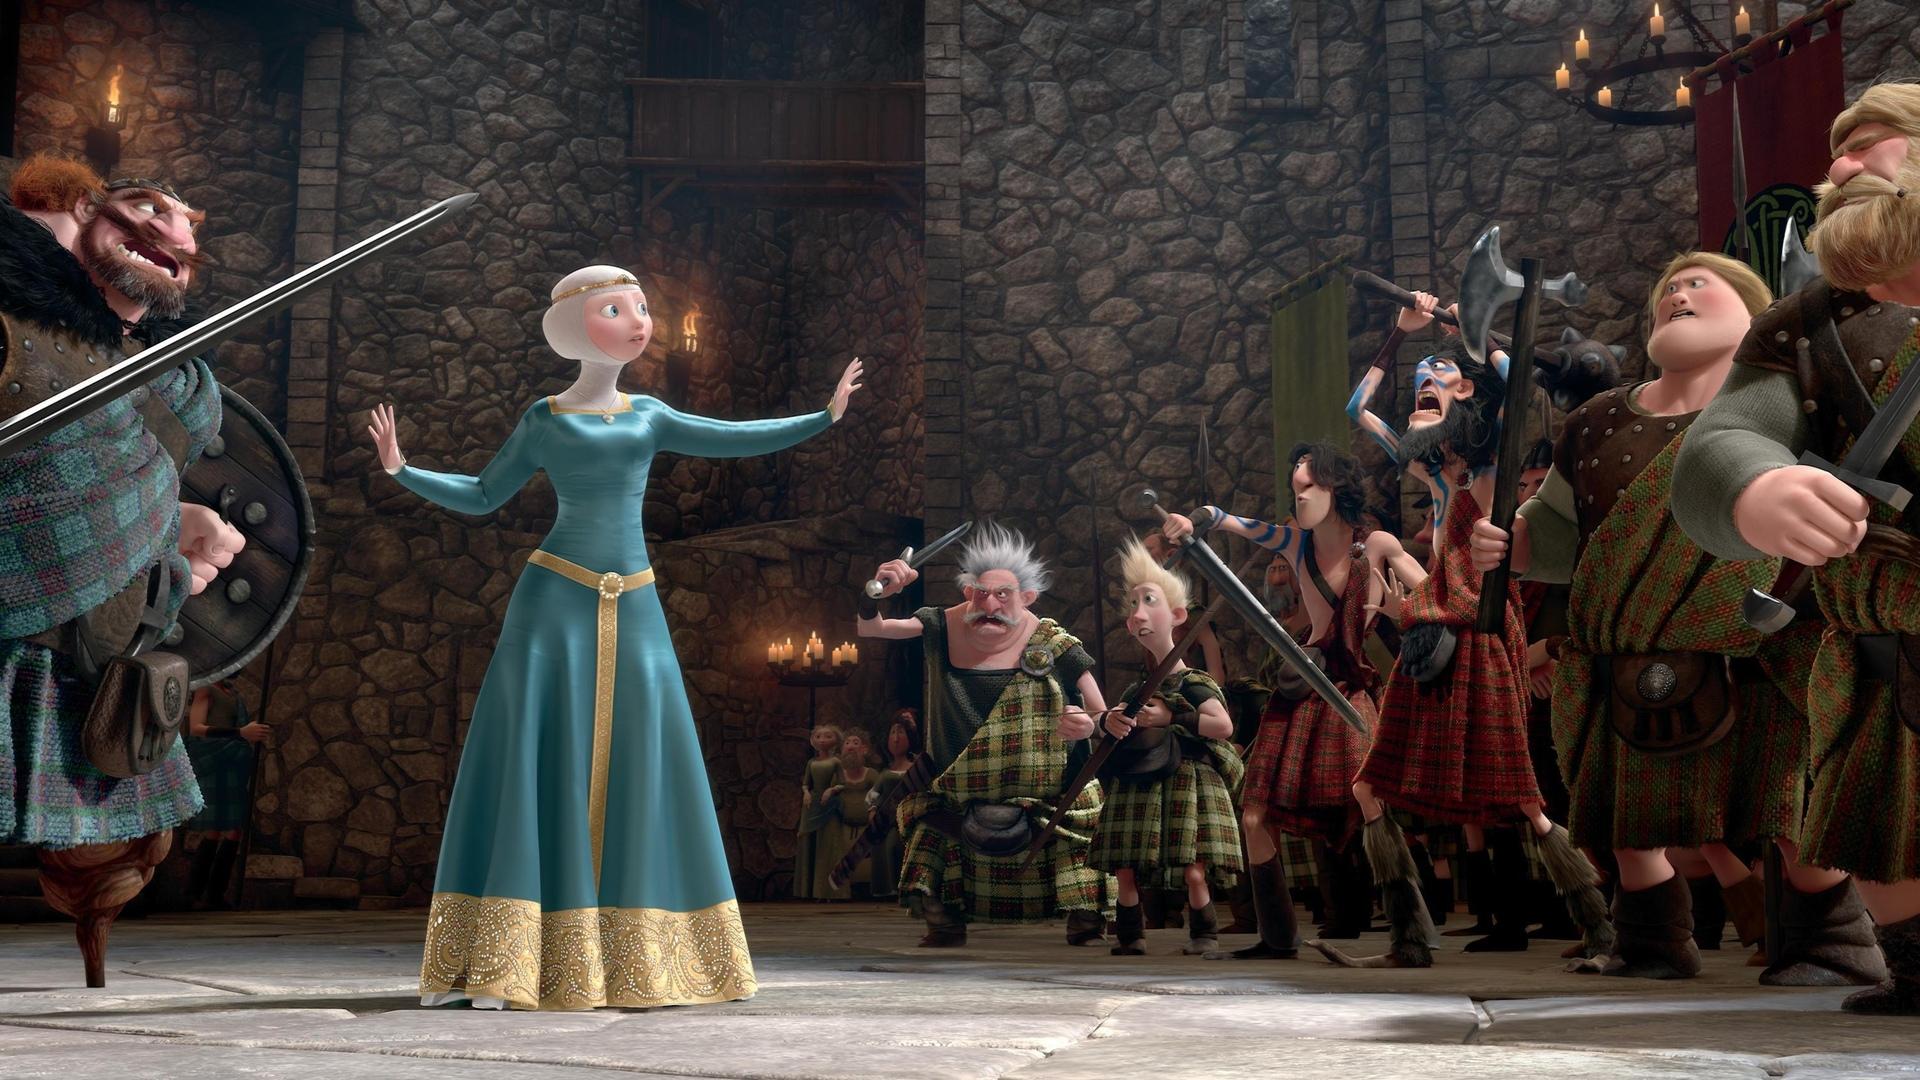 Disney Brave Wallpaper